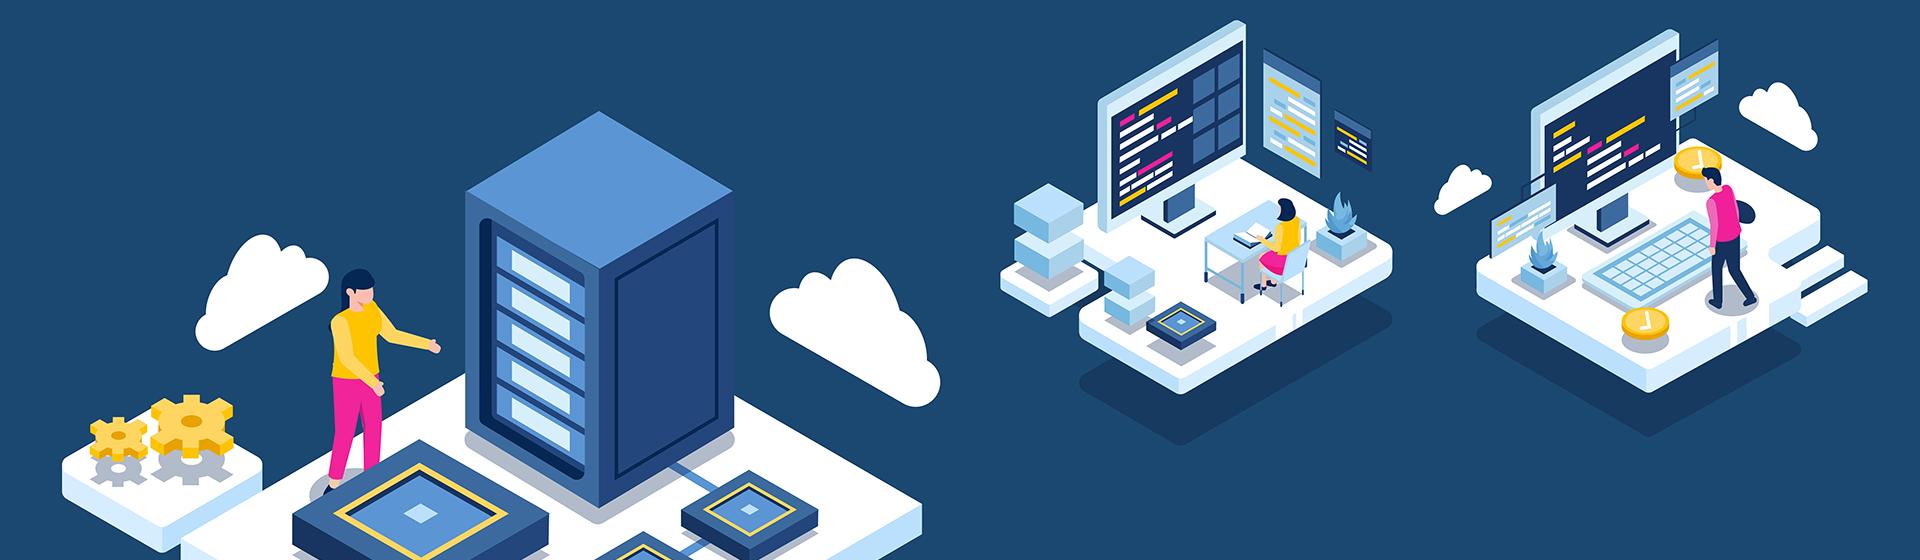 Server Virtualization Services